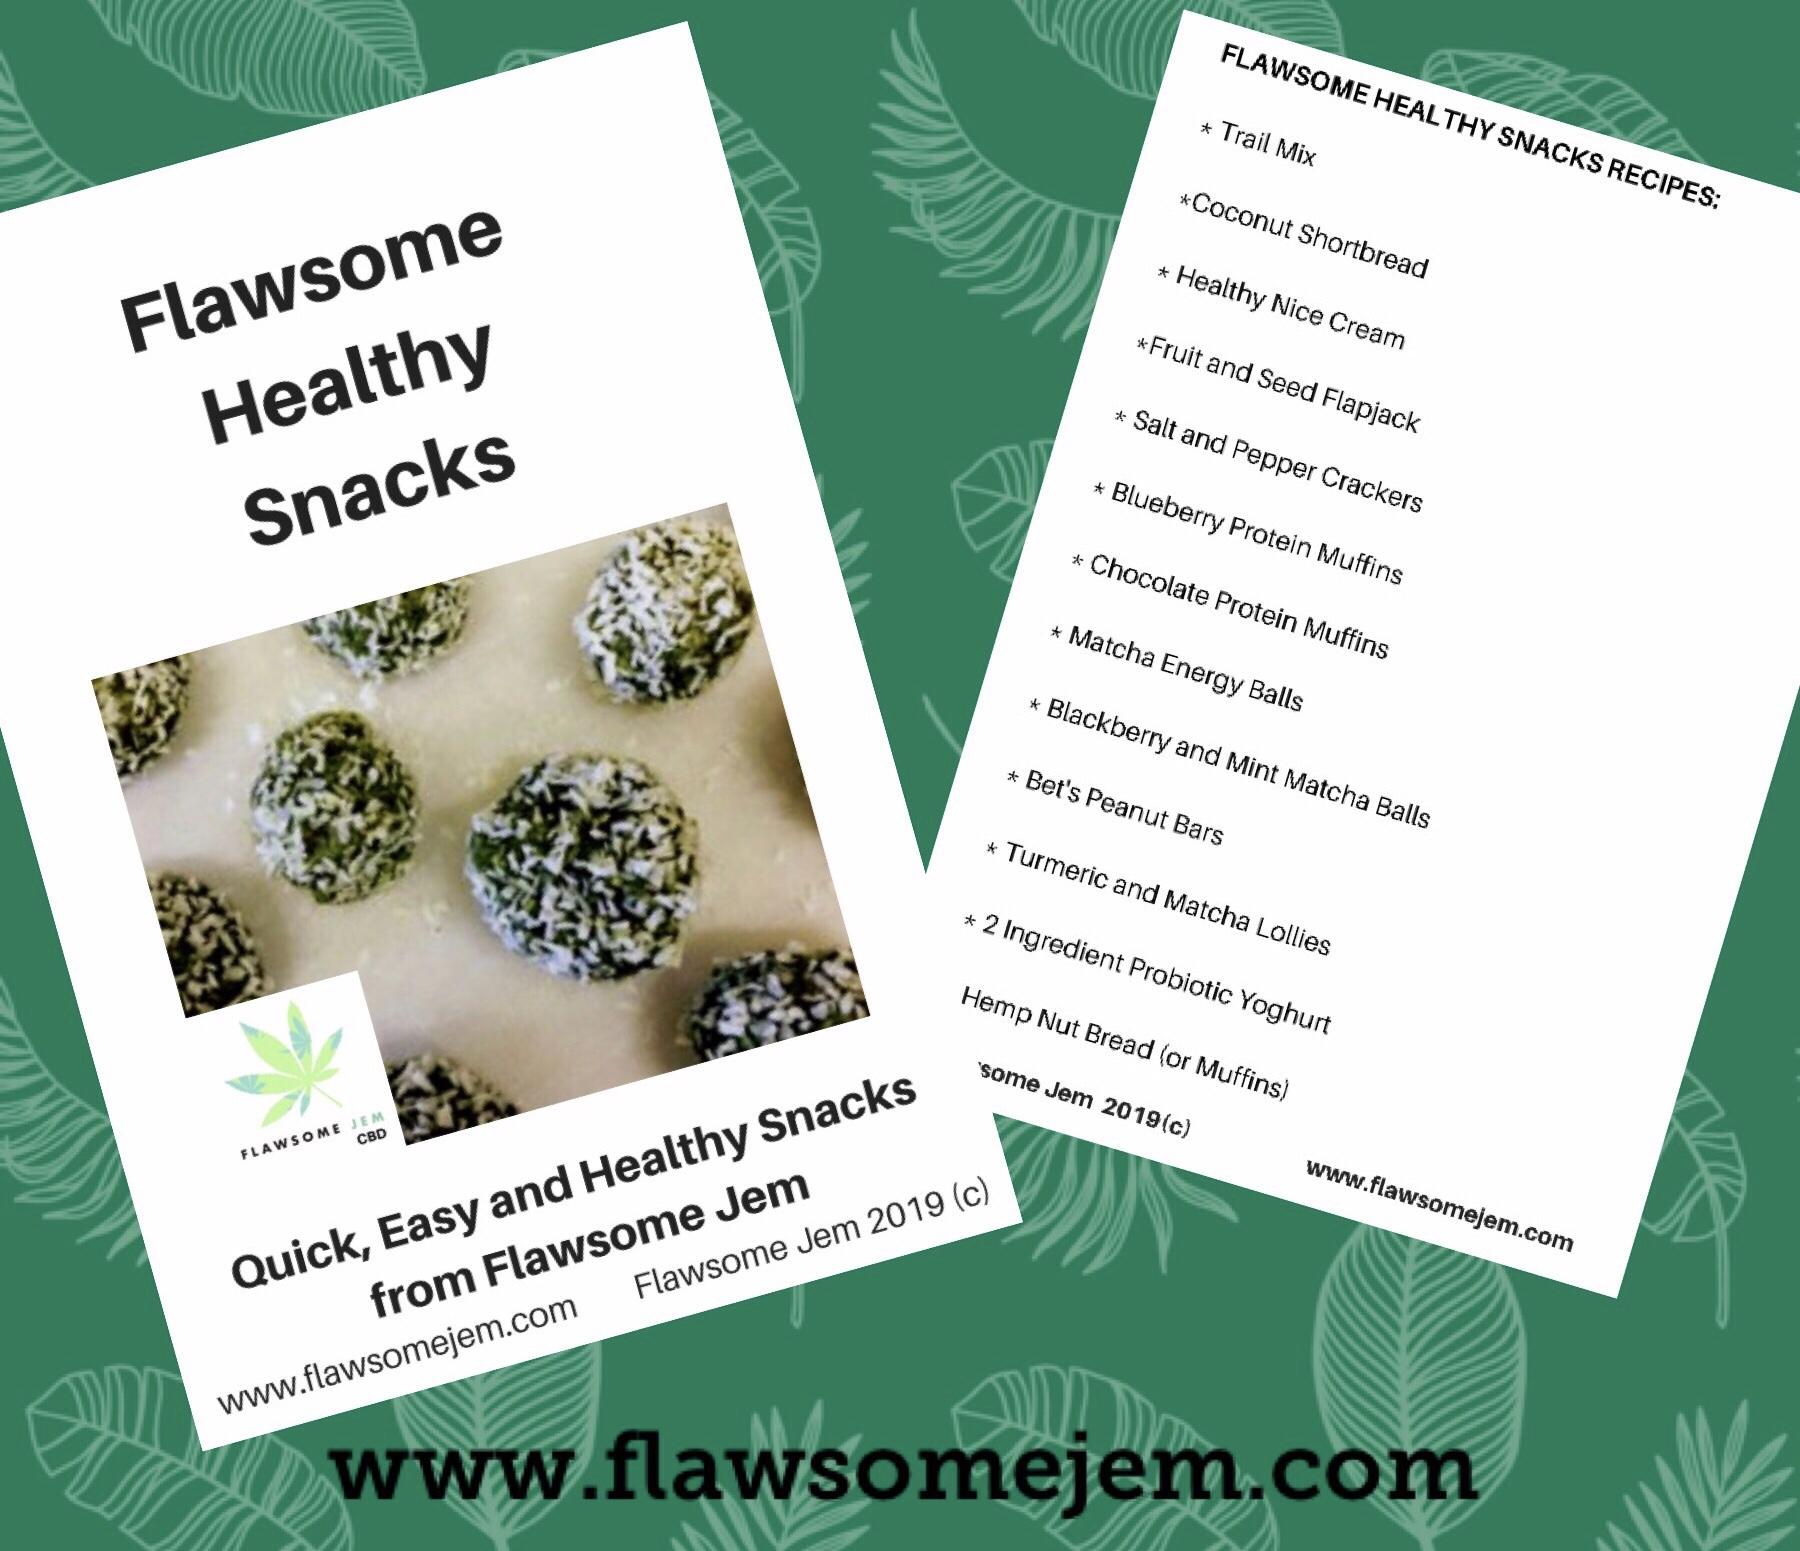 Flawsome Snack Recipes